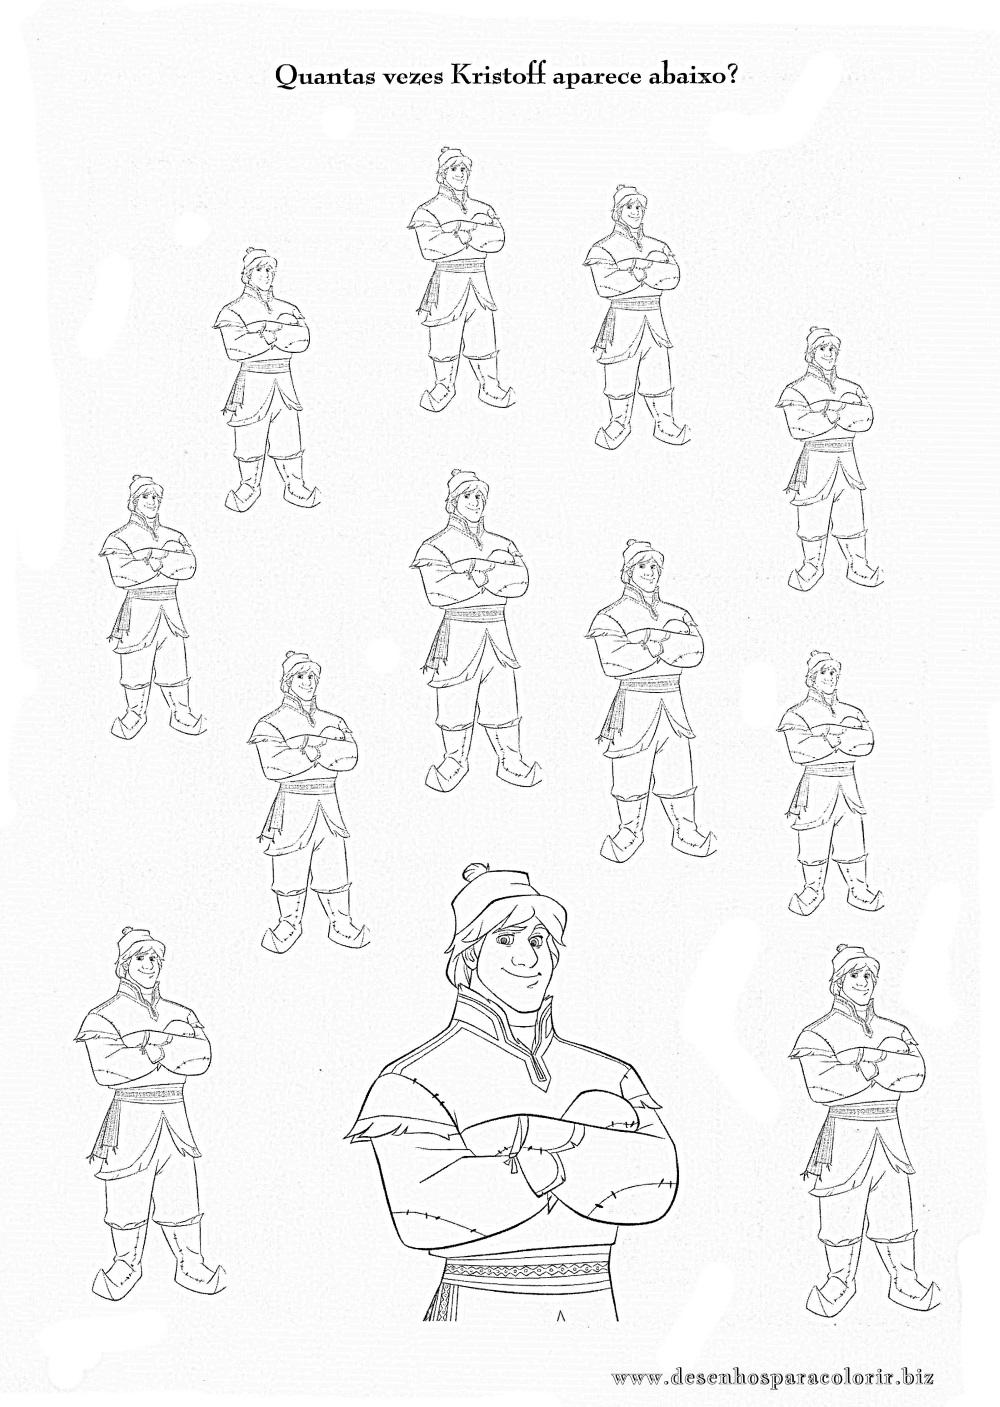 desenhos para colorir  17 desenhos para colorir da frozen